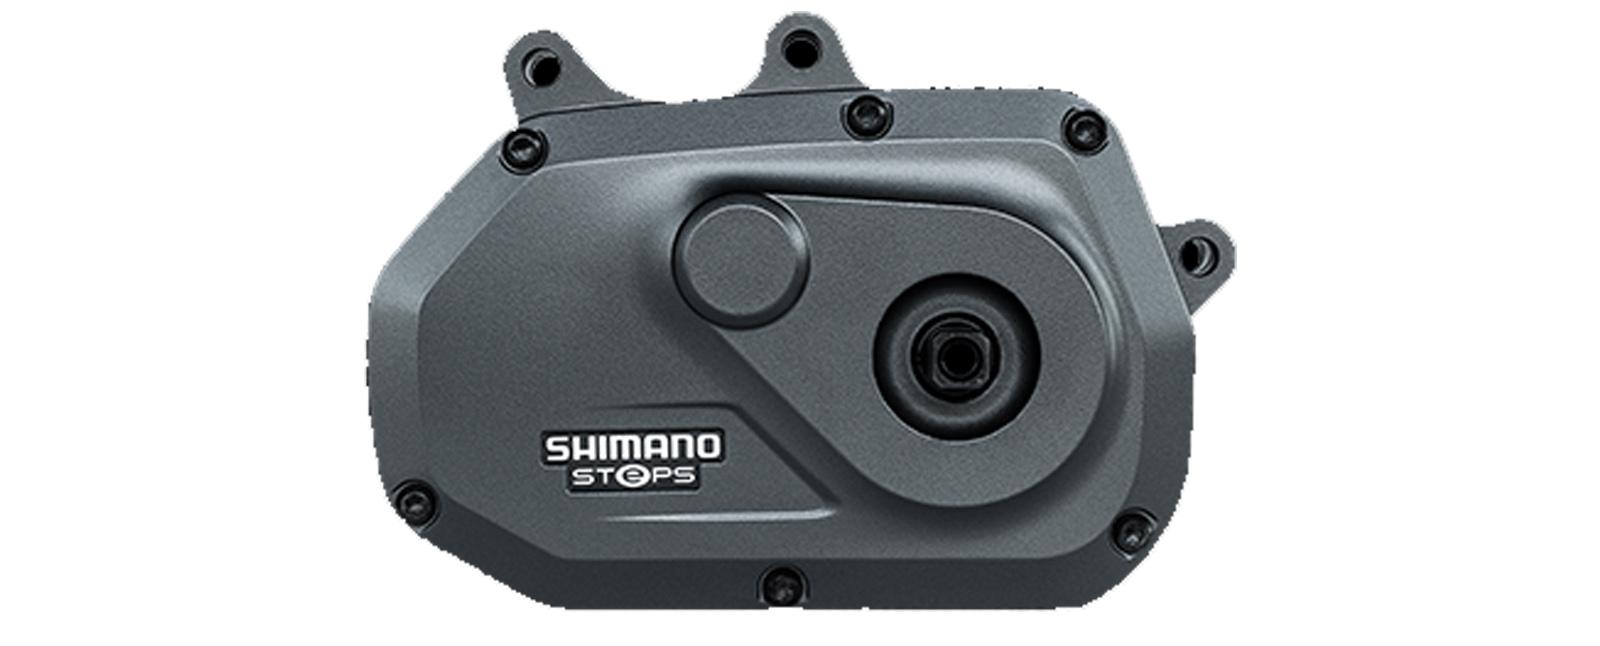 Shimano Motor STEPS